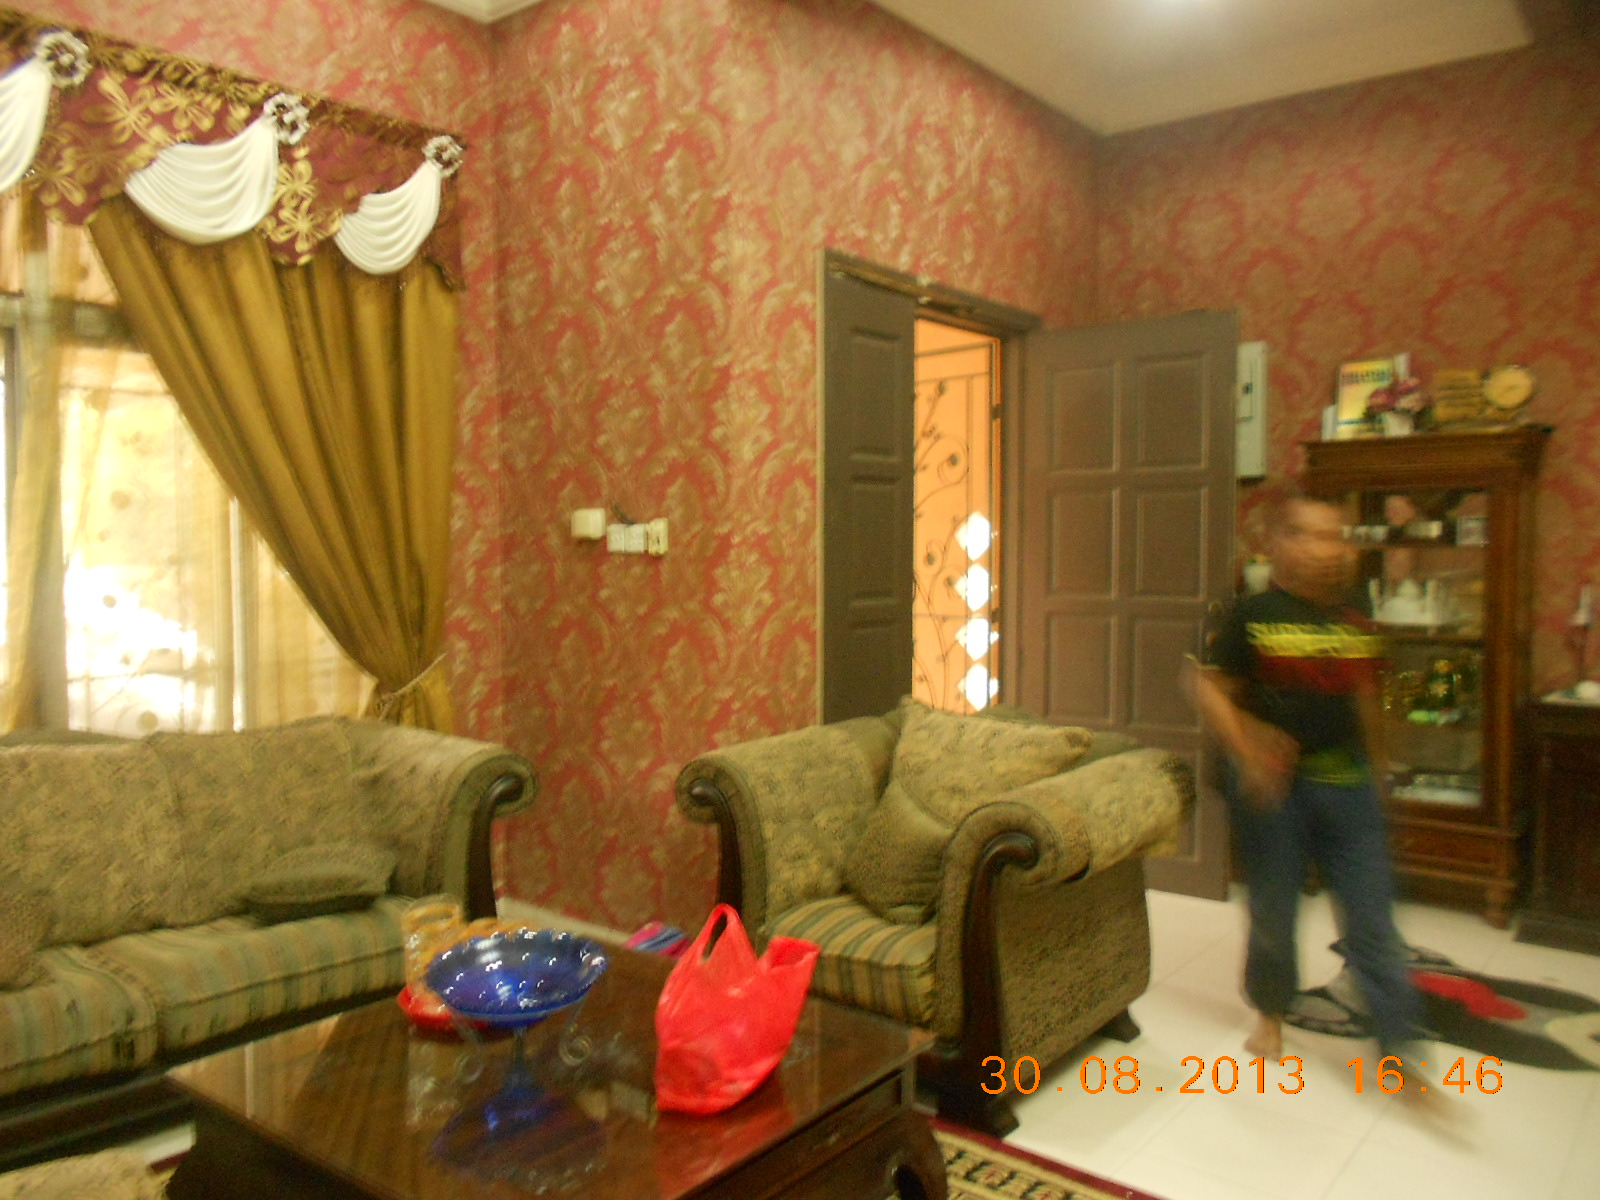 repair sofa shah alam clark sleeper rumah 3 tingkat dengan wallpaper mewah baiti jannati deco